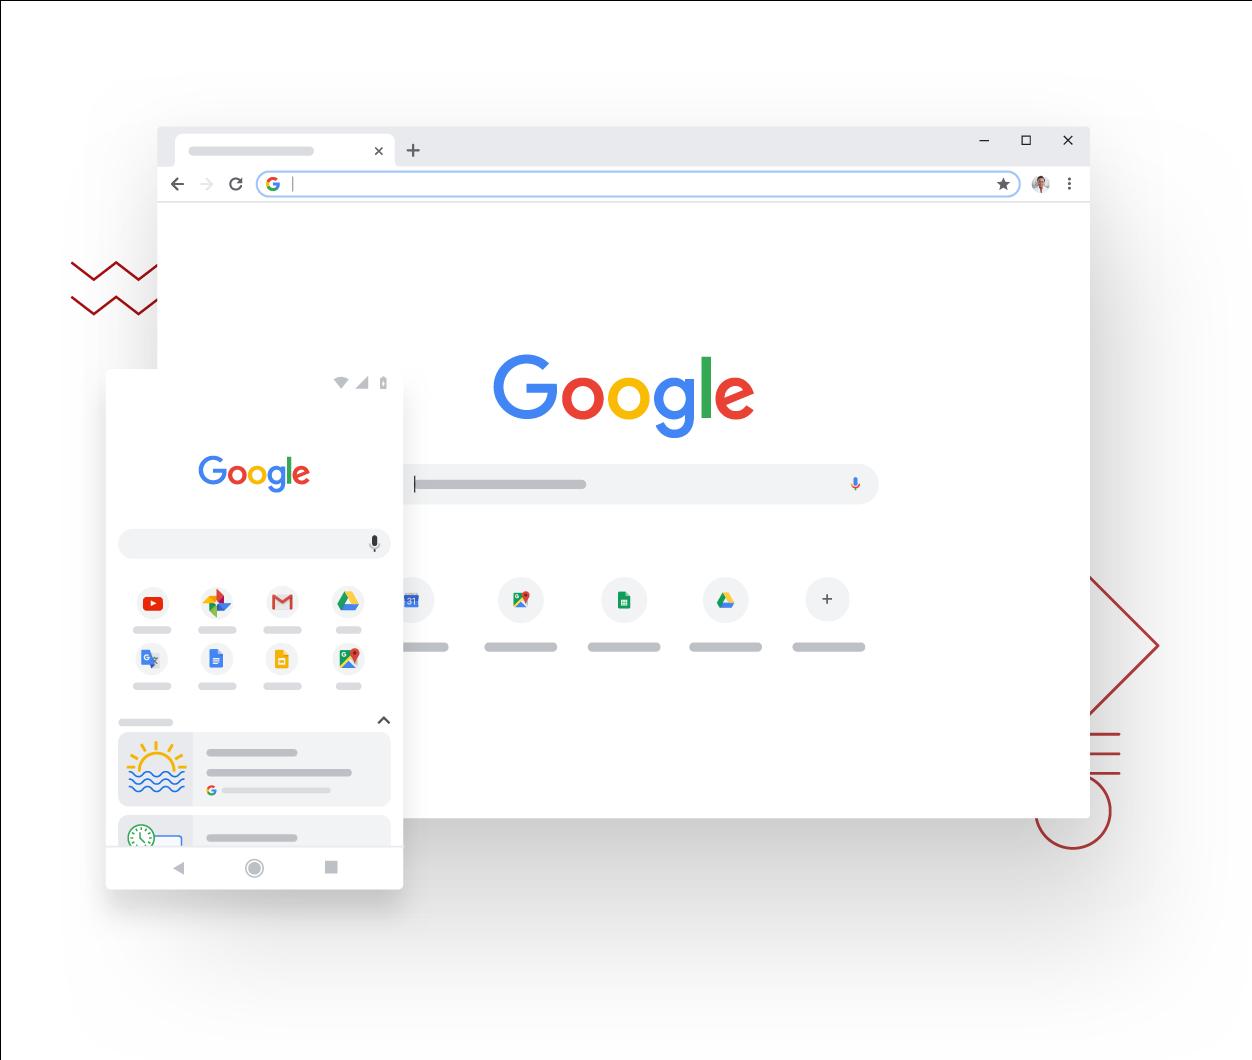 谷歌浏览器(Google Chrome) for mac 89.0.4389.90中文版